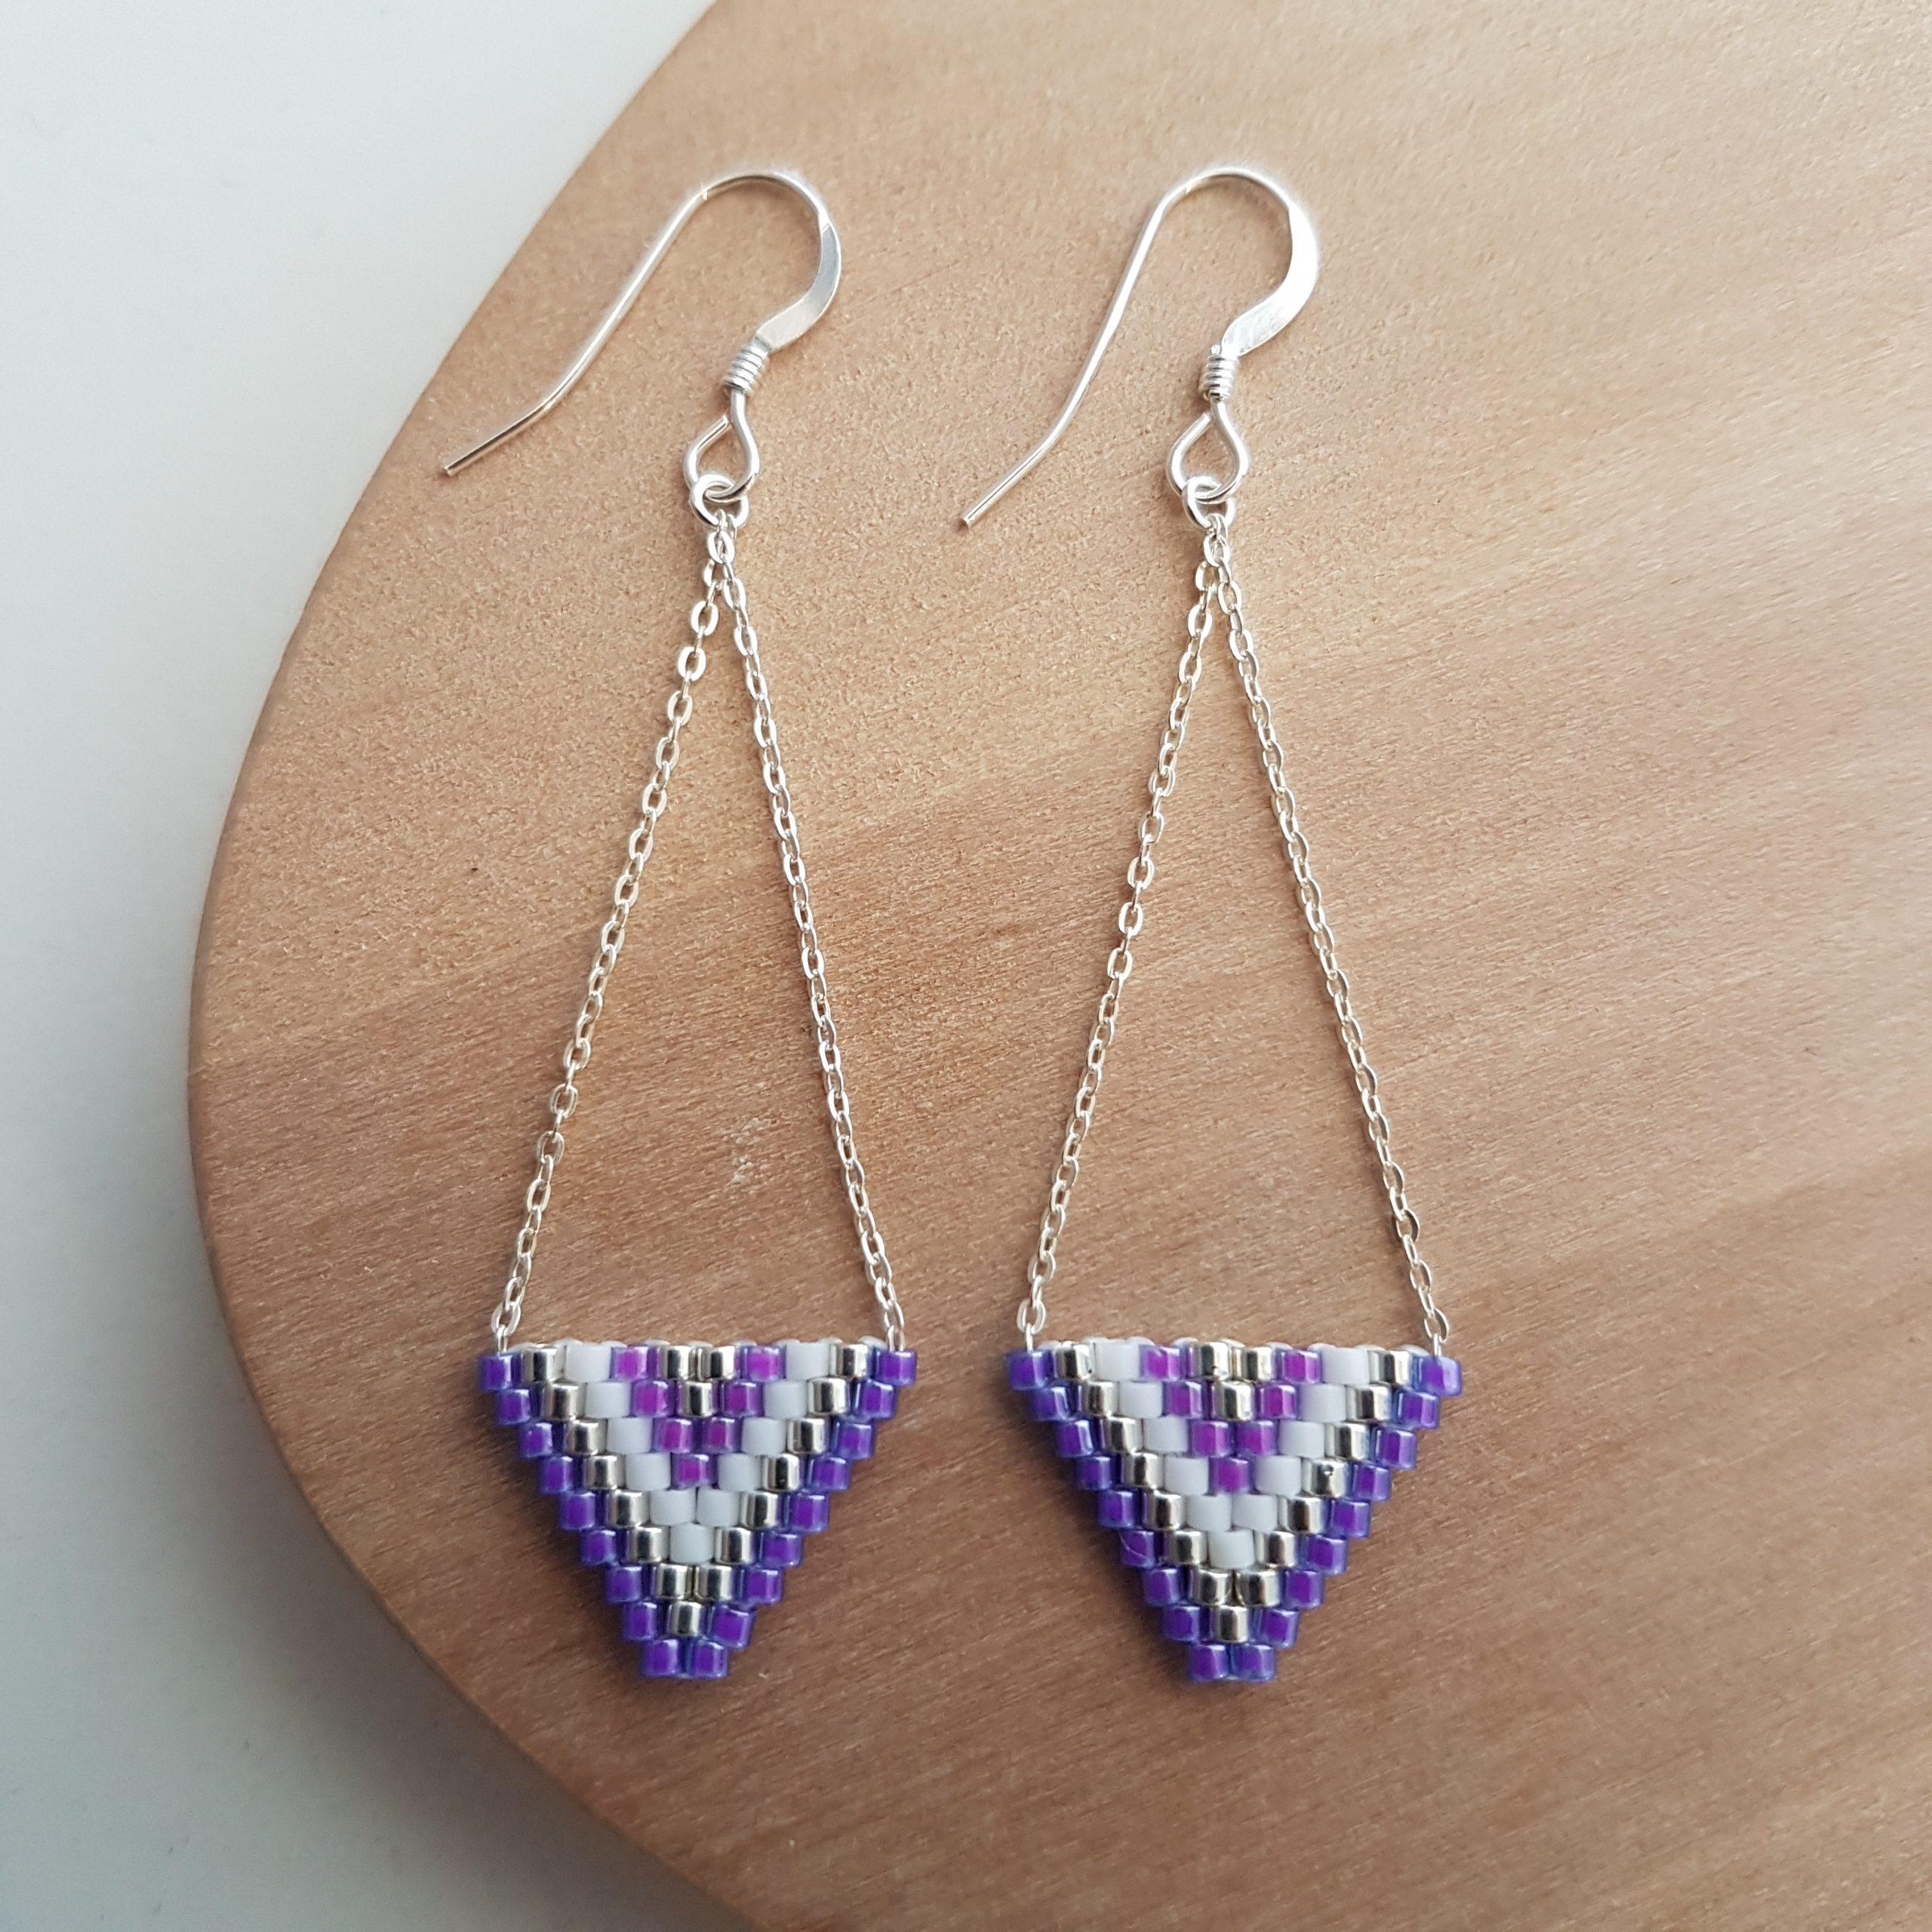 Cadeau femme Bijou artisanal lyon Boucles d'oreilles Alexandra violet argent 925 miyuki